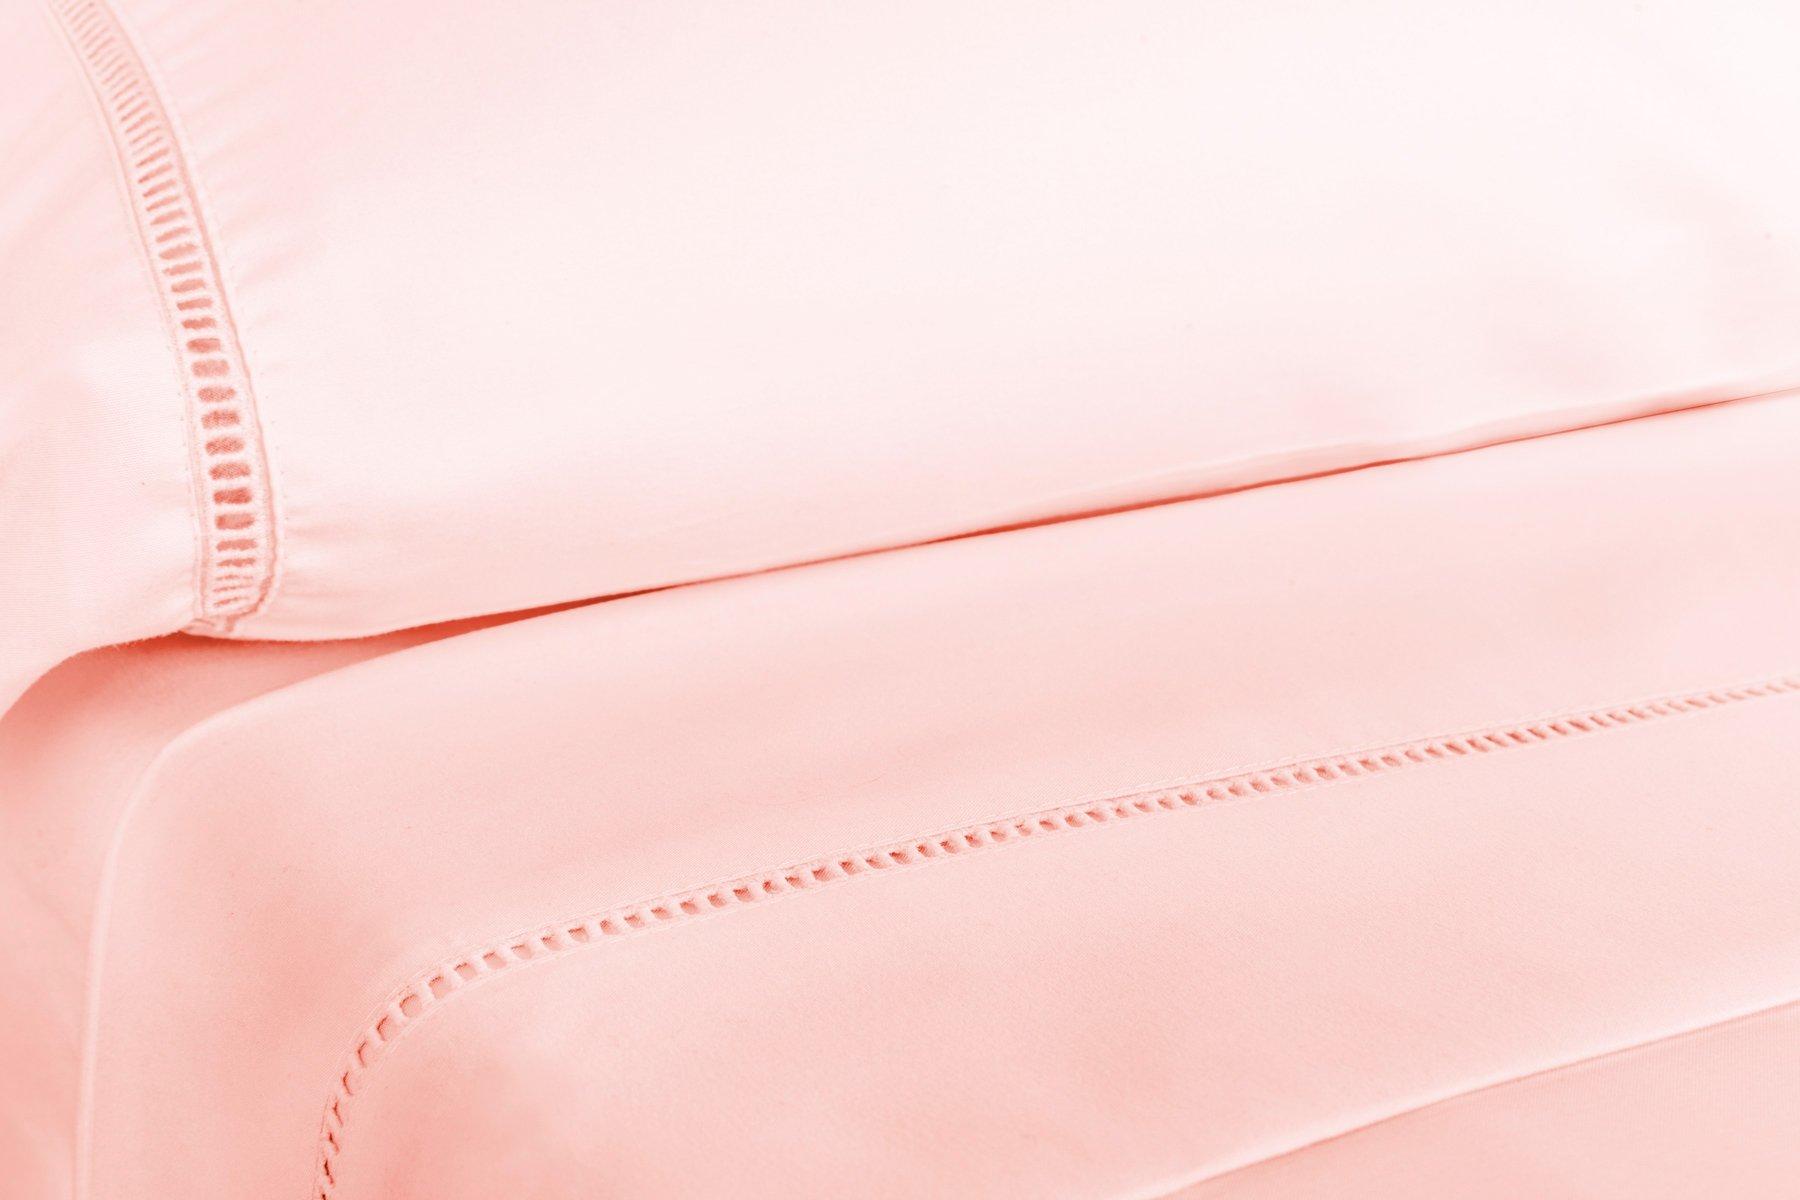 Grace Premium Microfiber Sheet Set - Super Soft, Deep Pocket, Embellished with Hypoallergenic, Wrinkle Resistant and Fade Resistant Brushed Microfiber – 4 Piece Set (Full, Pink) by ViscoSoft (Image #4)